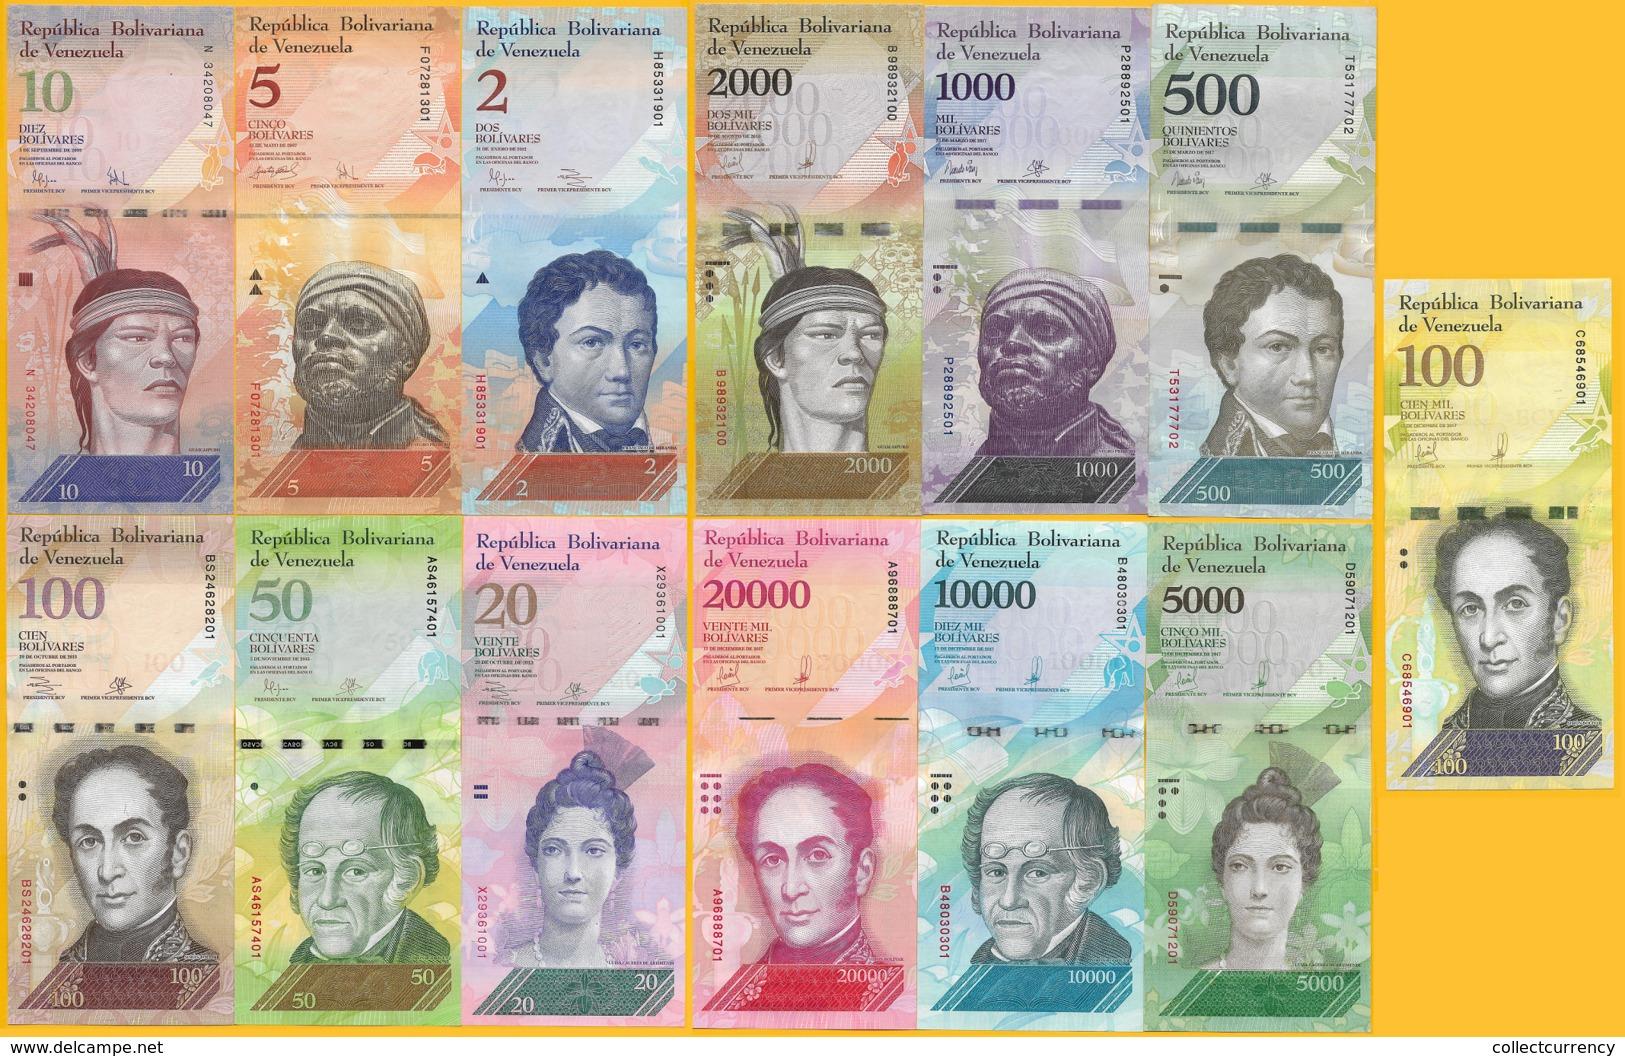 Venezuela Set 2 5 10 20 50 100 500 1000 2000 5000 10000 20000 100000 Bolivares (Set Of 13 Banknotes) UNC - Venezuela